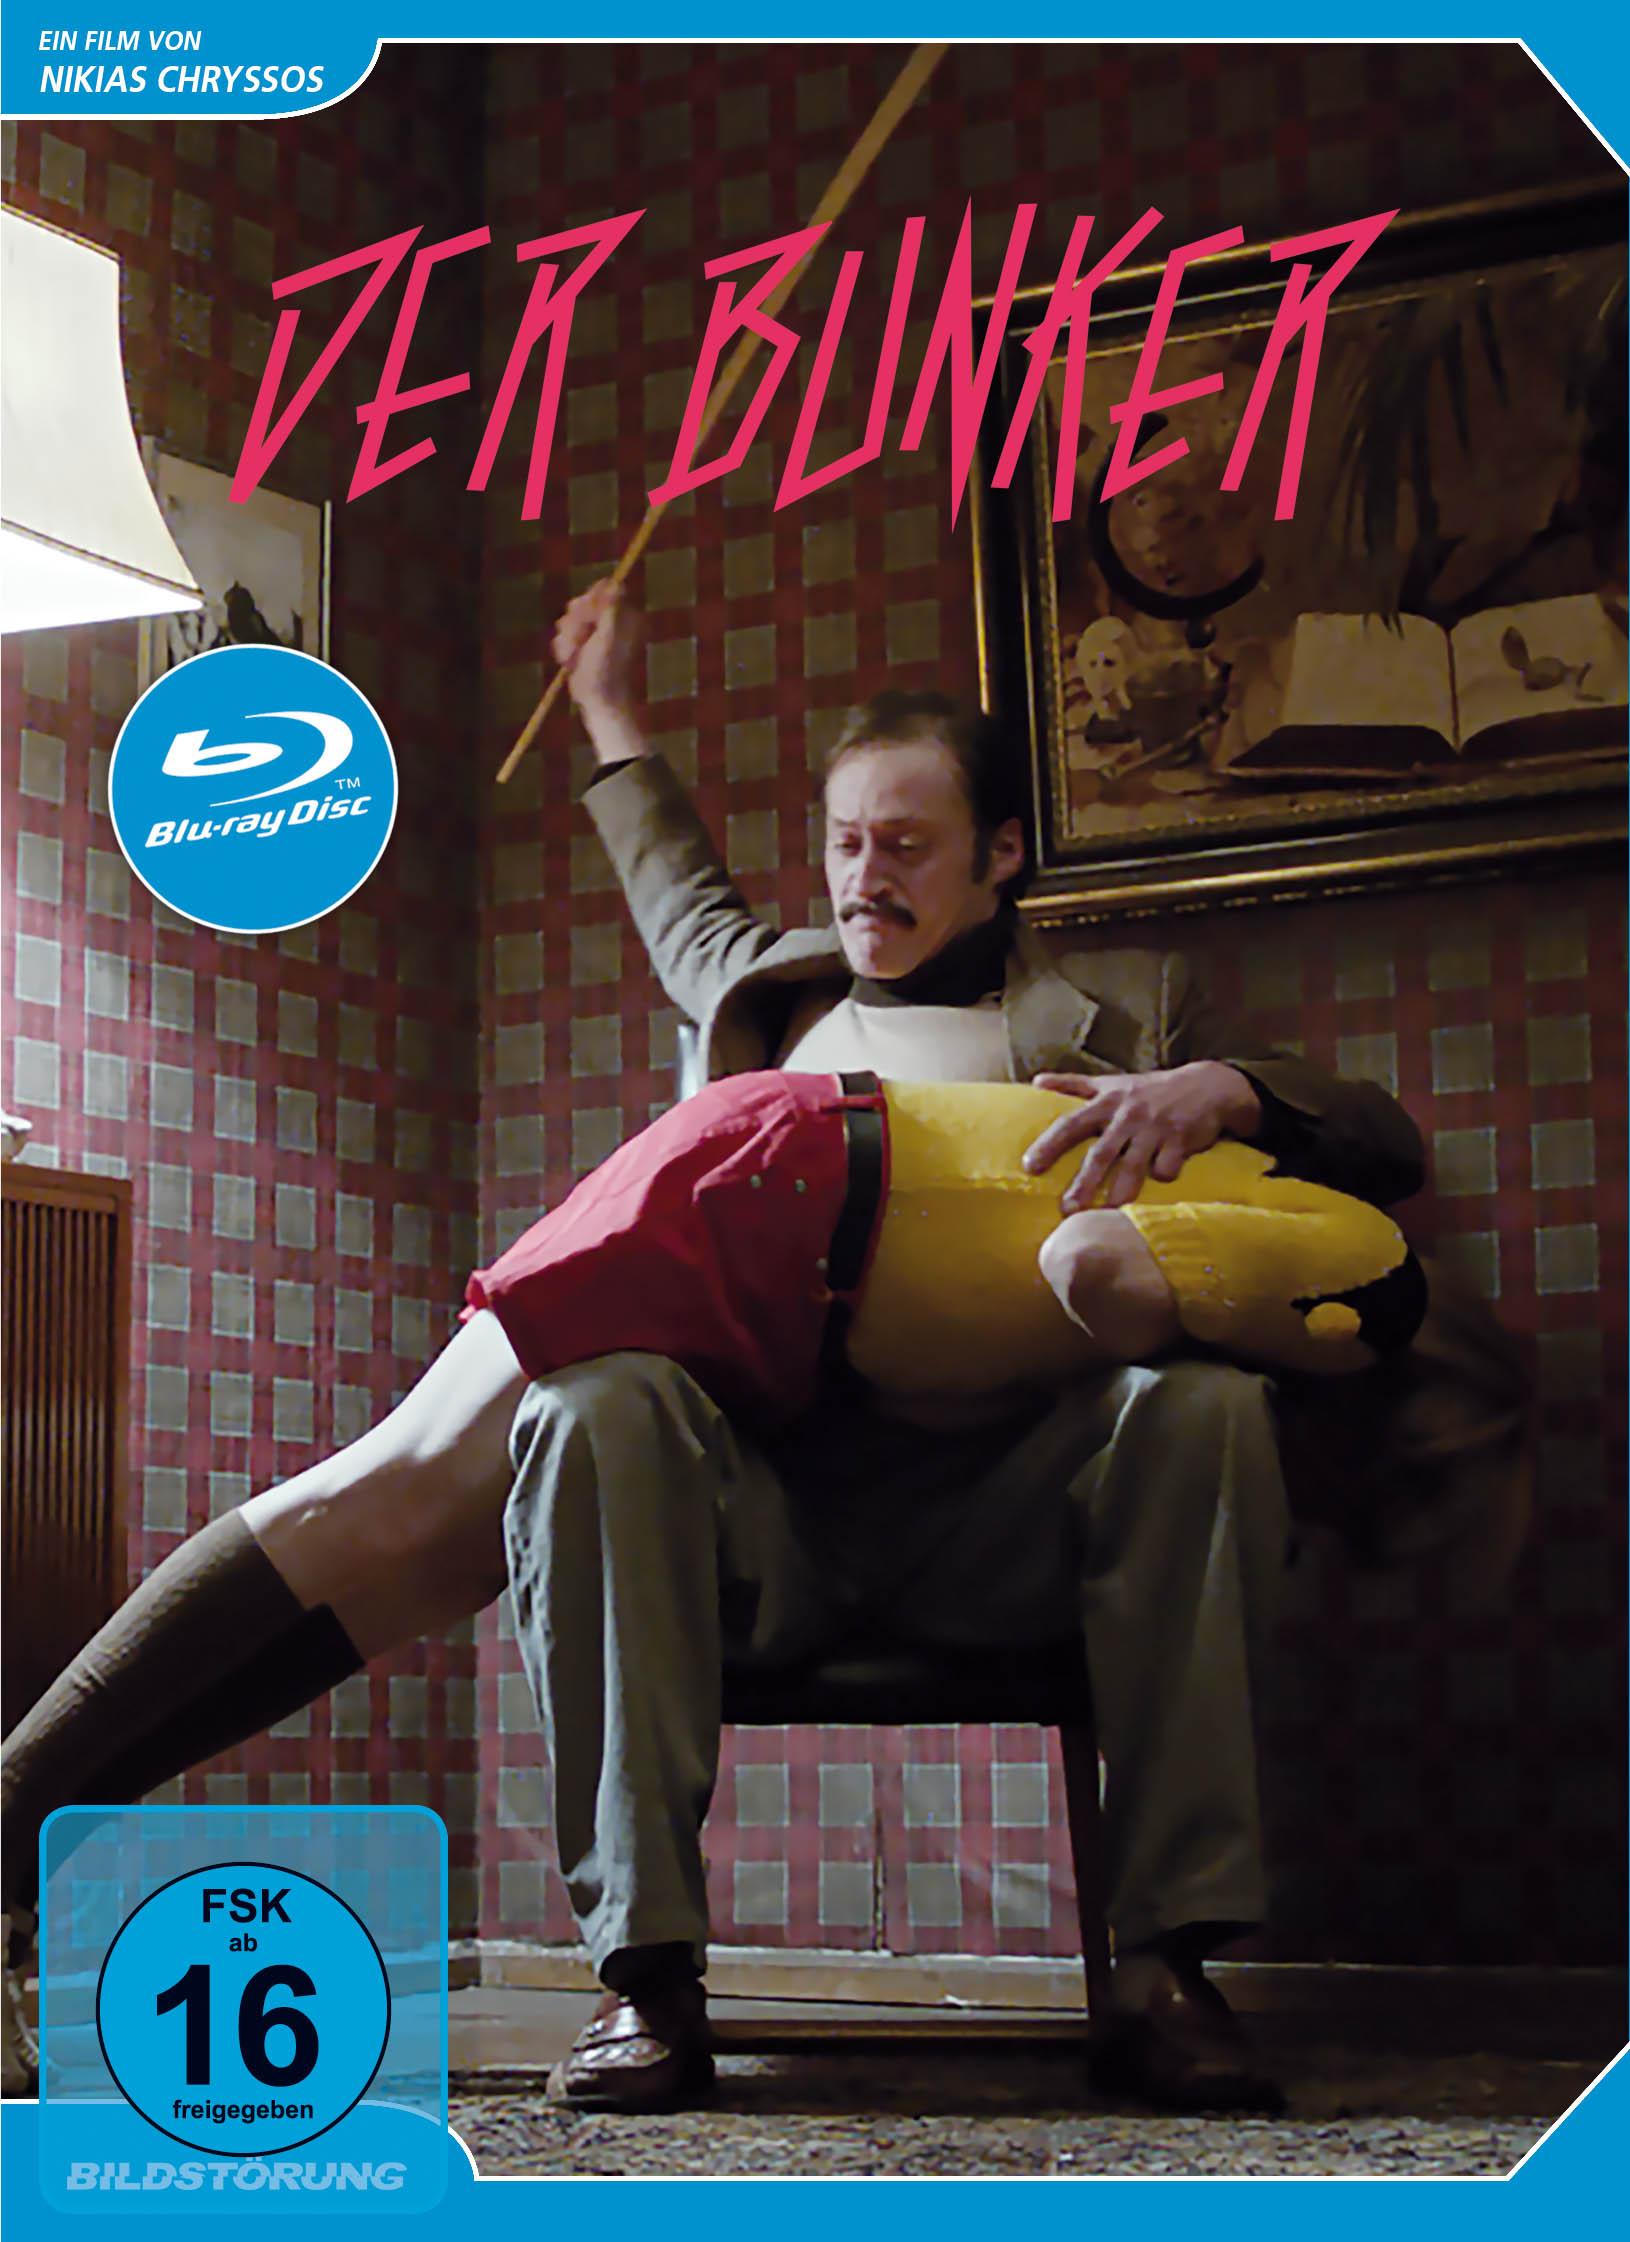 Packshot Blu-ray